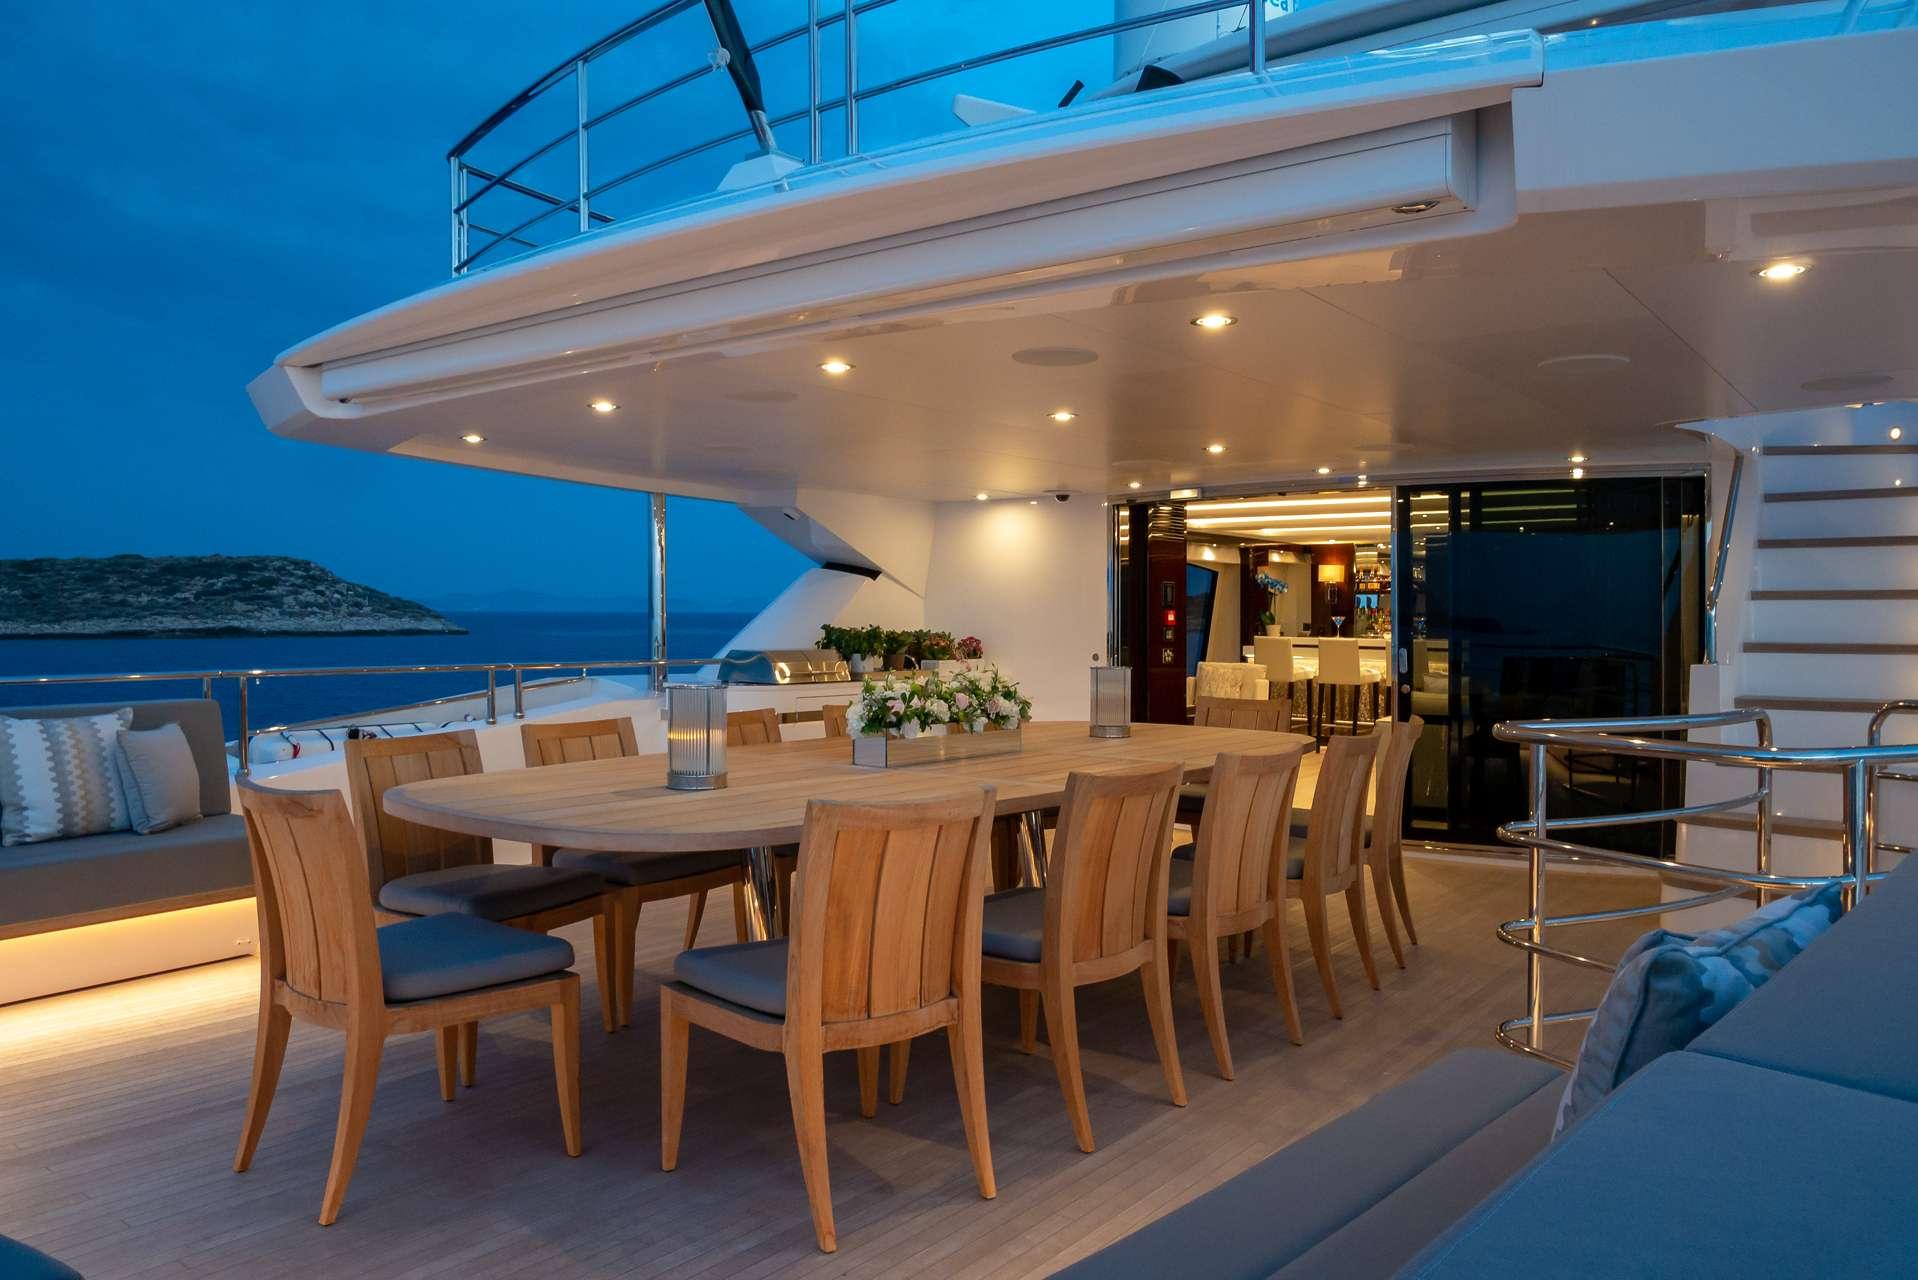 Upper deck dining area